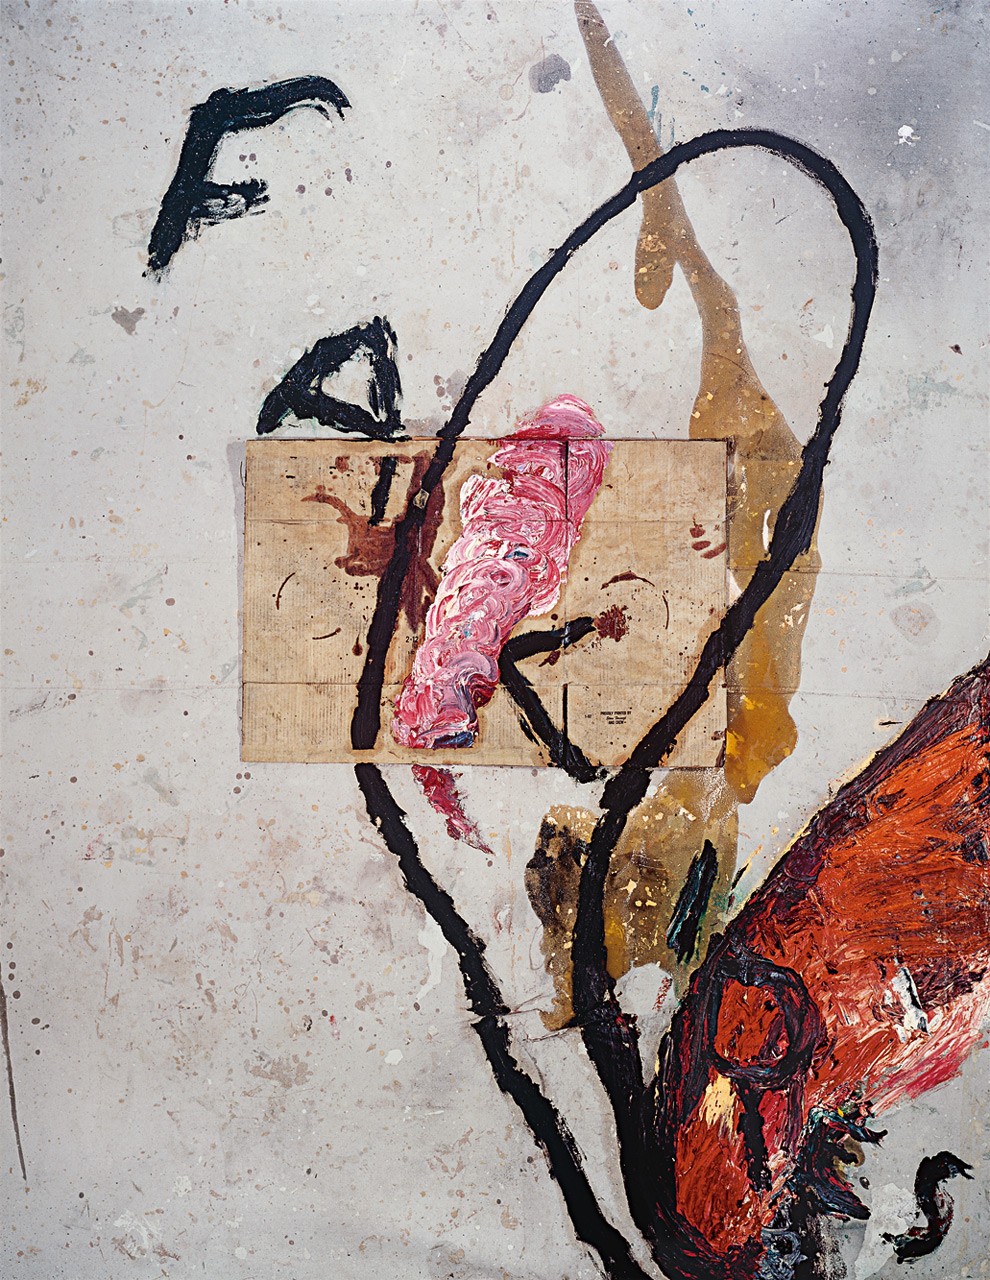 Fakires | Julian Schnabel | Guggenheim Bilbao Museoa